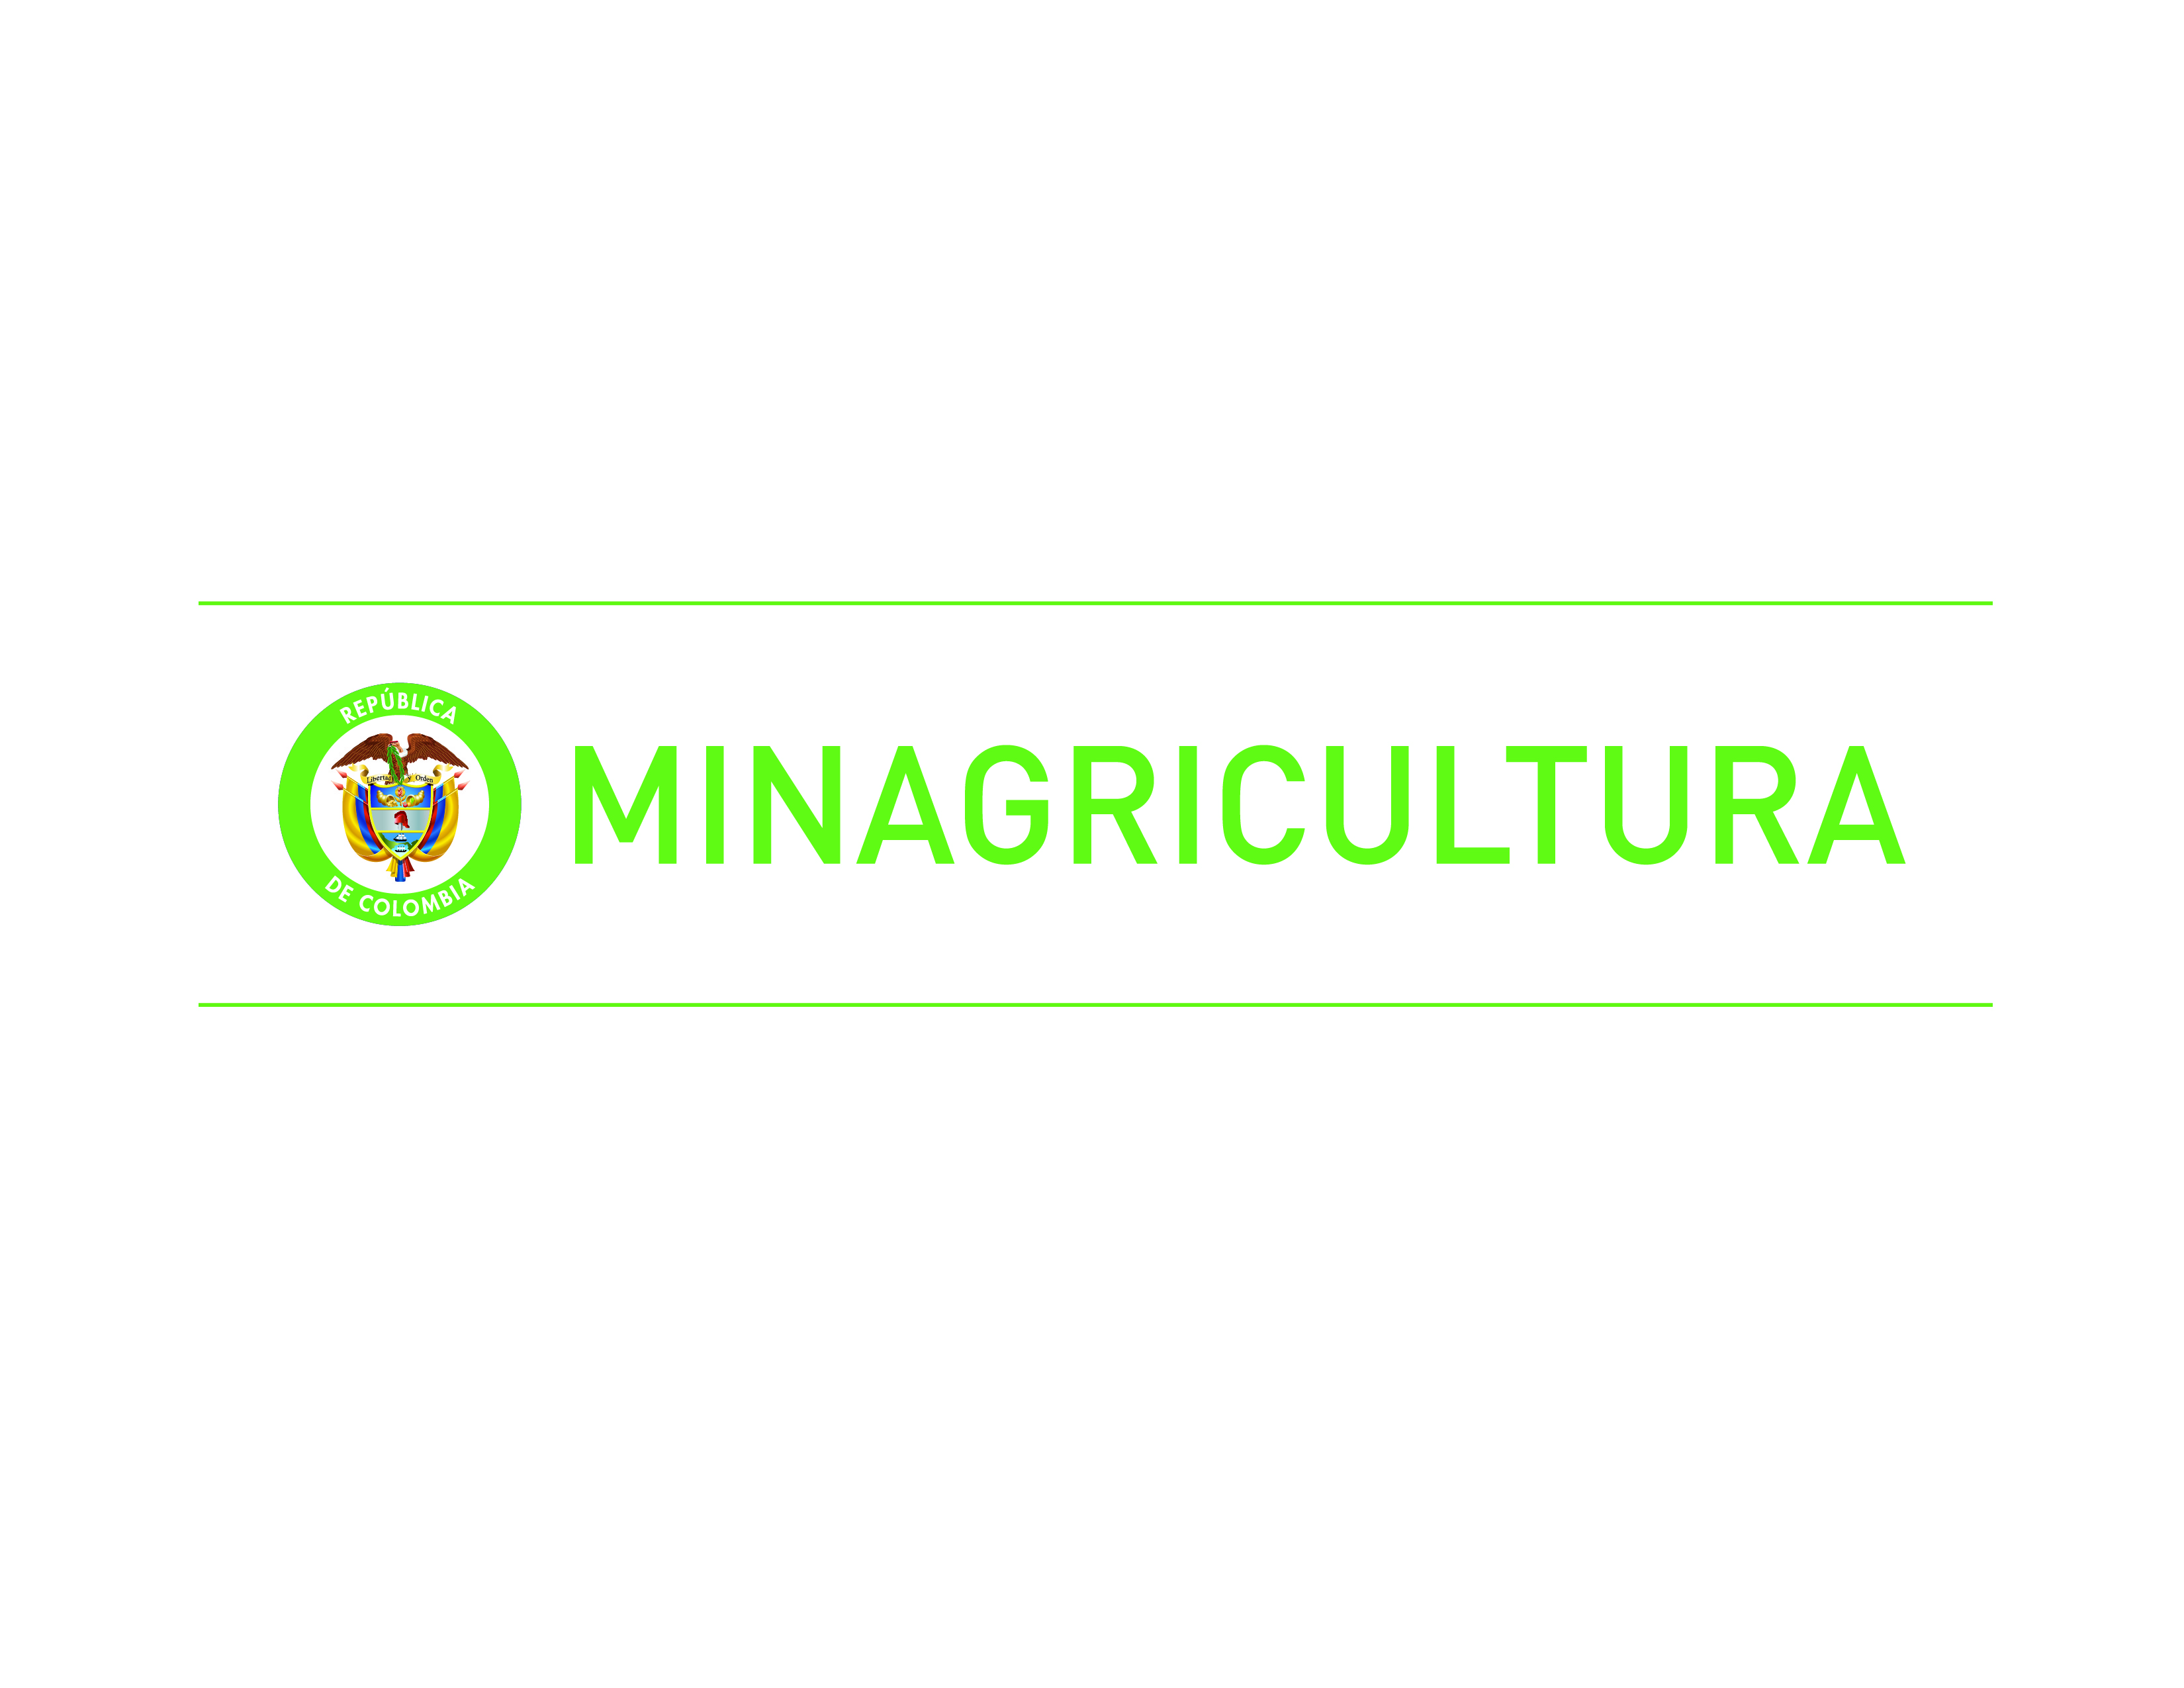 Resultado de imagen para logo minagricultura.gov.co